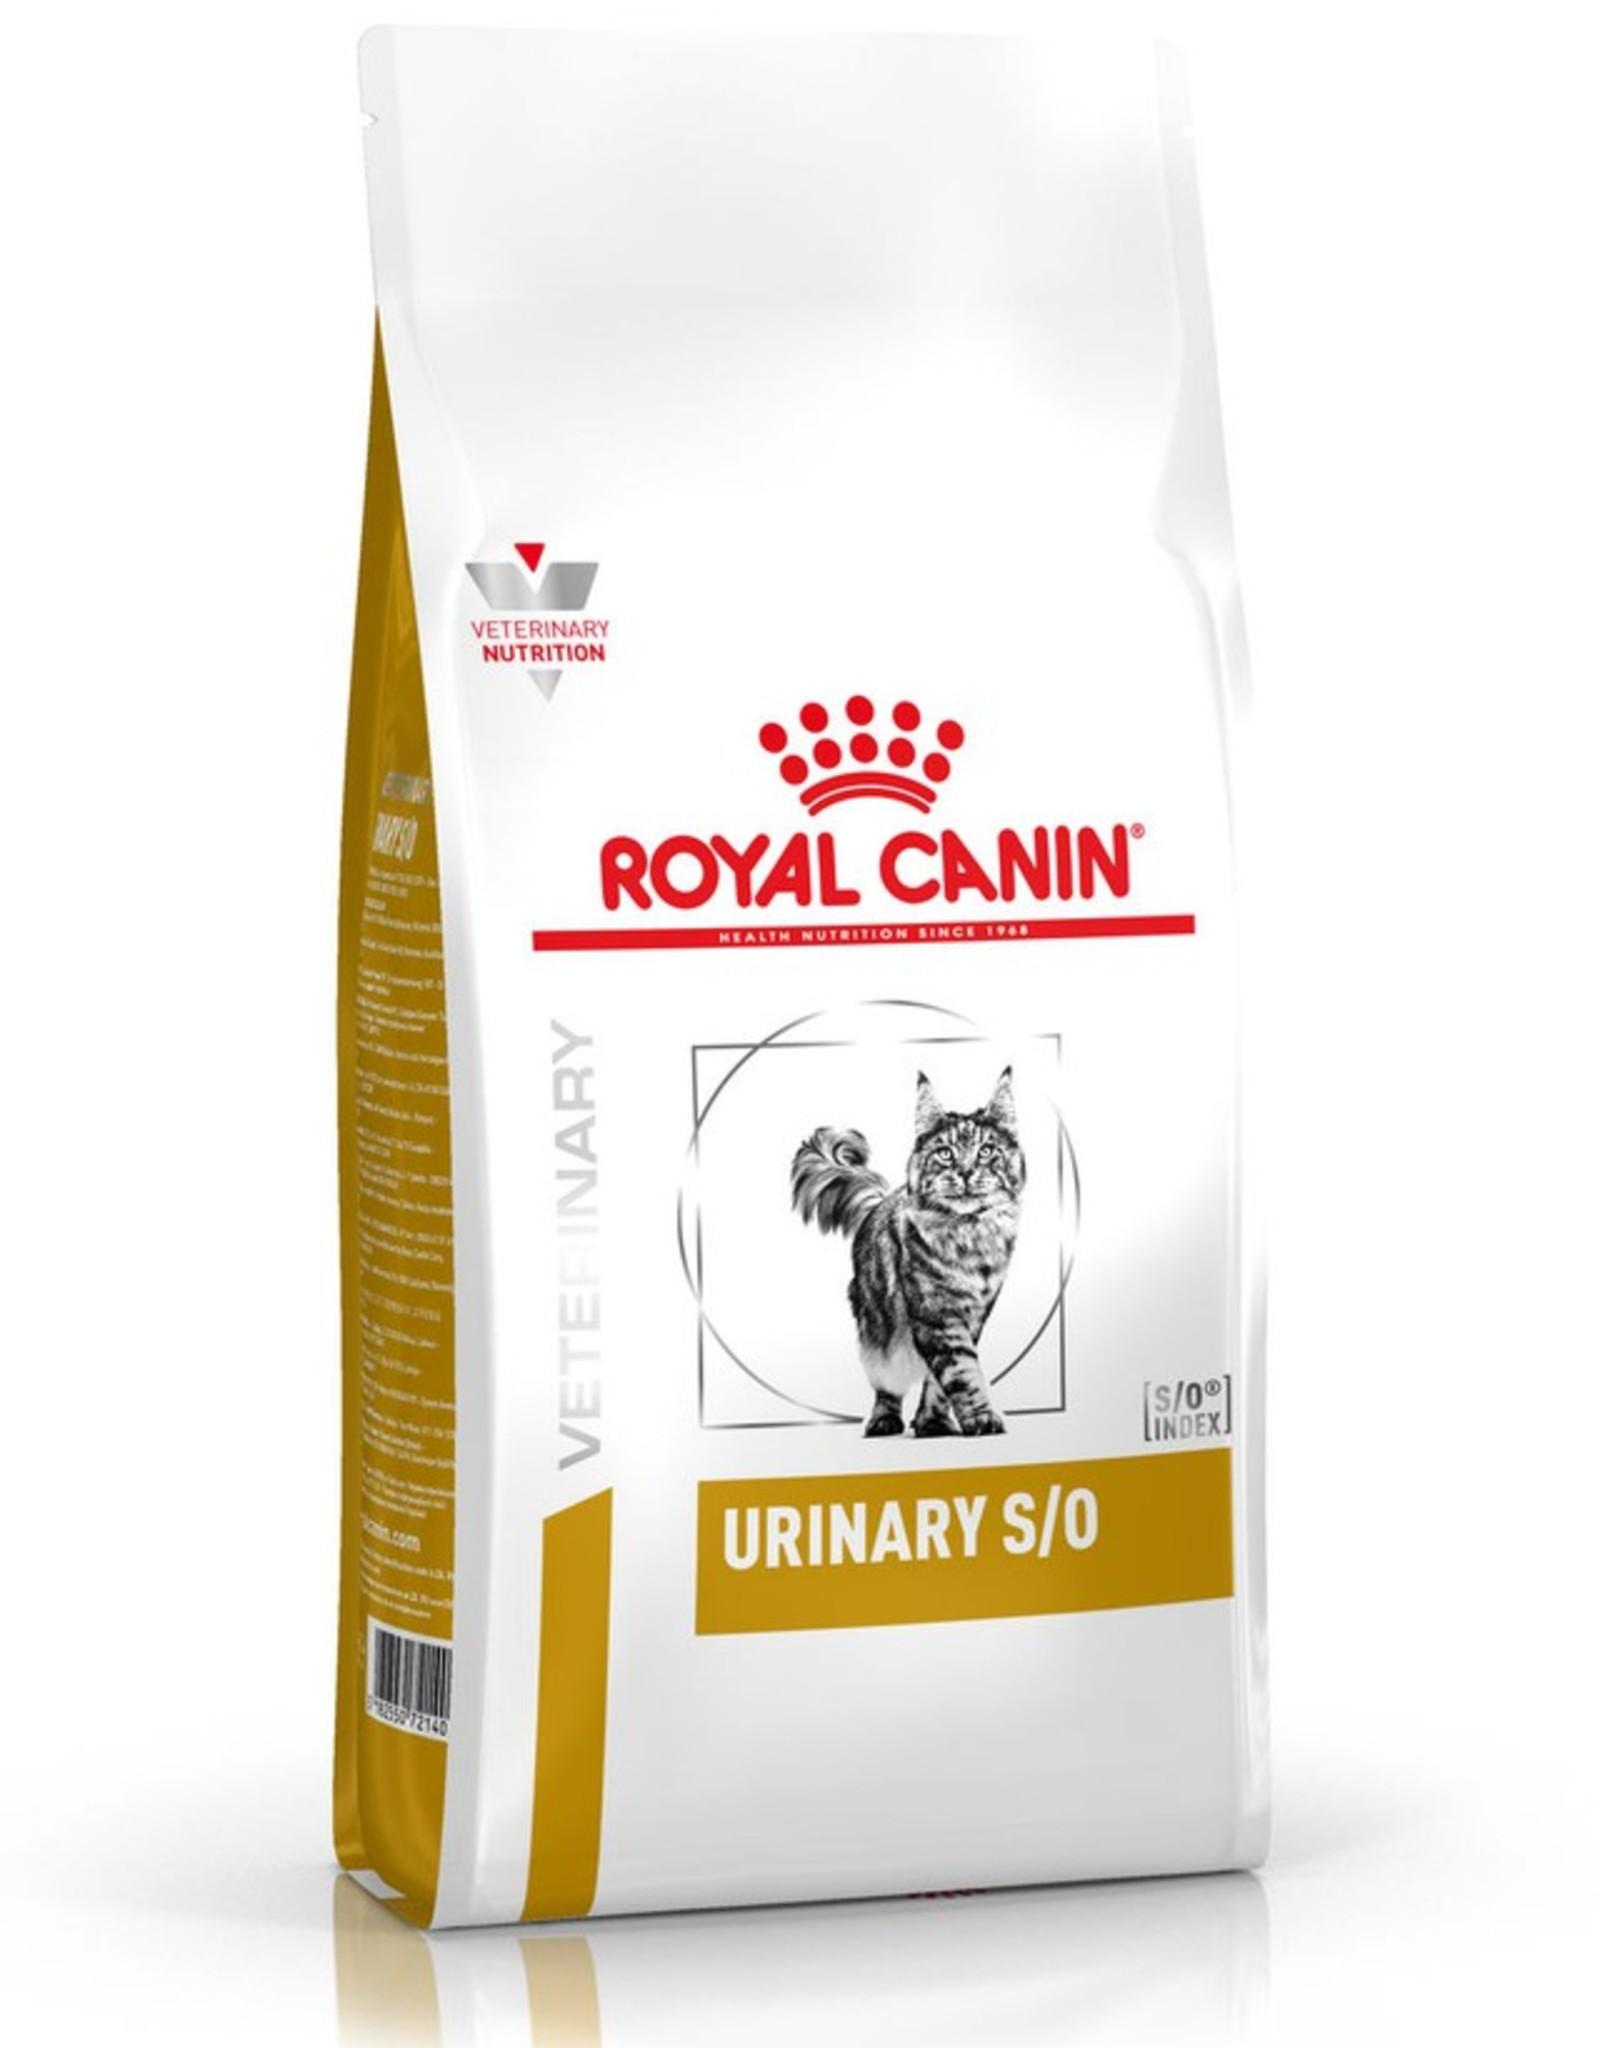 Royal Canin Royal Canin Urinary S/o Chat 9kg